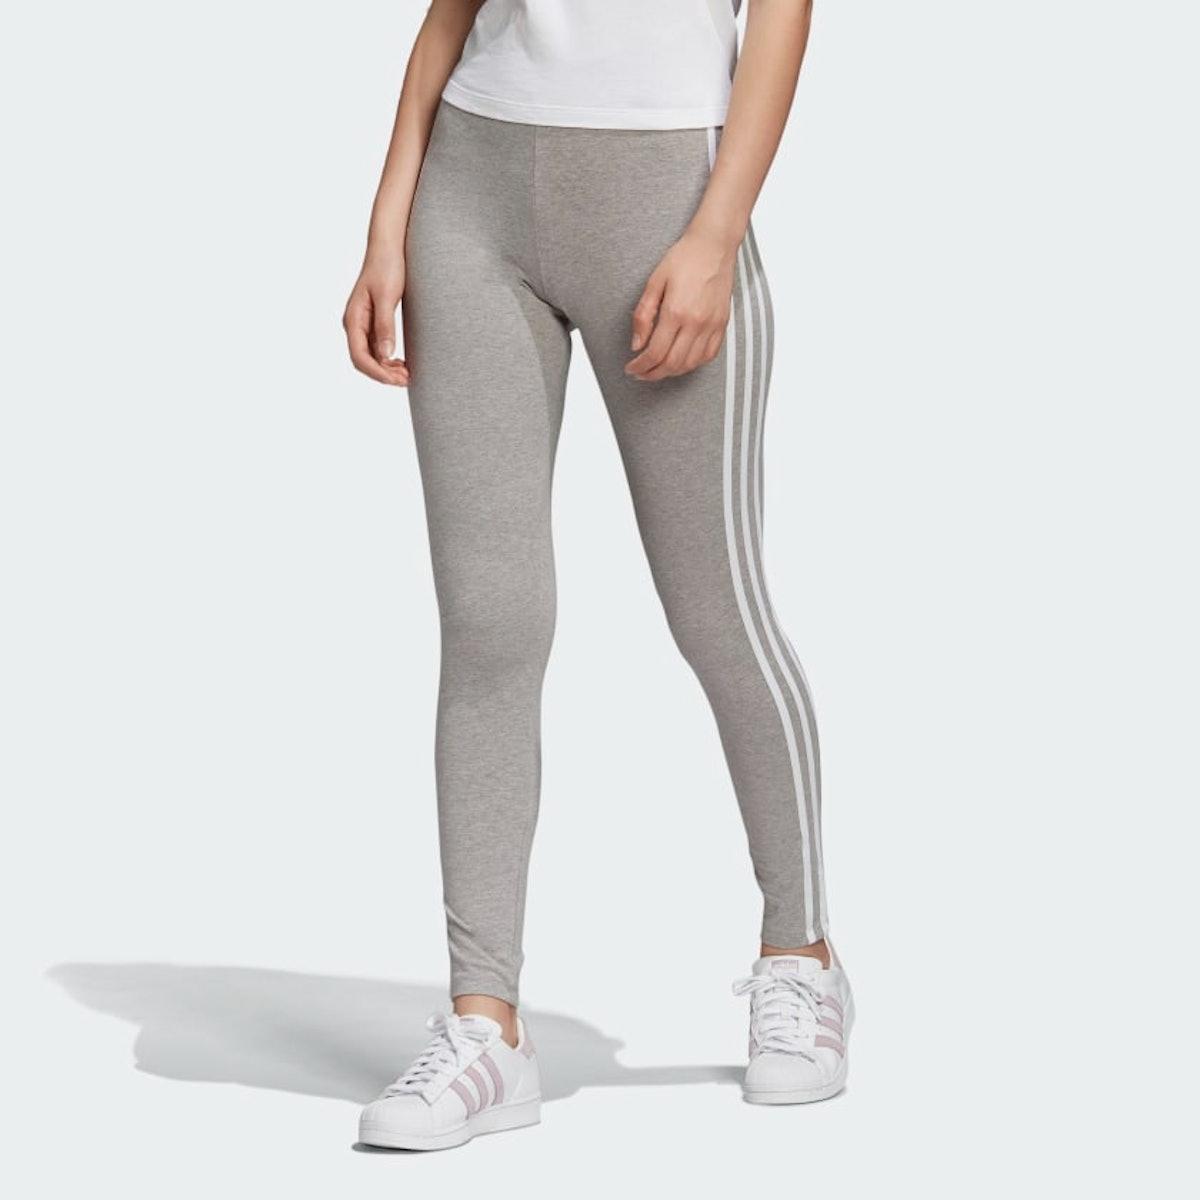 Adidas 3-Striped Tights